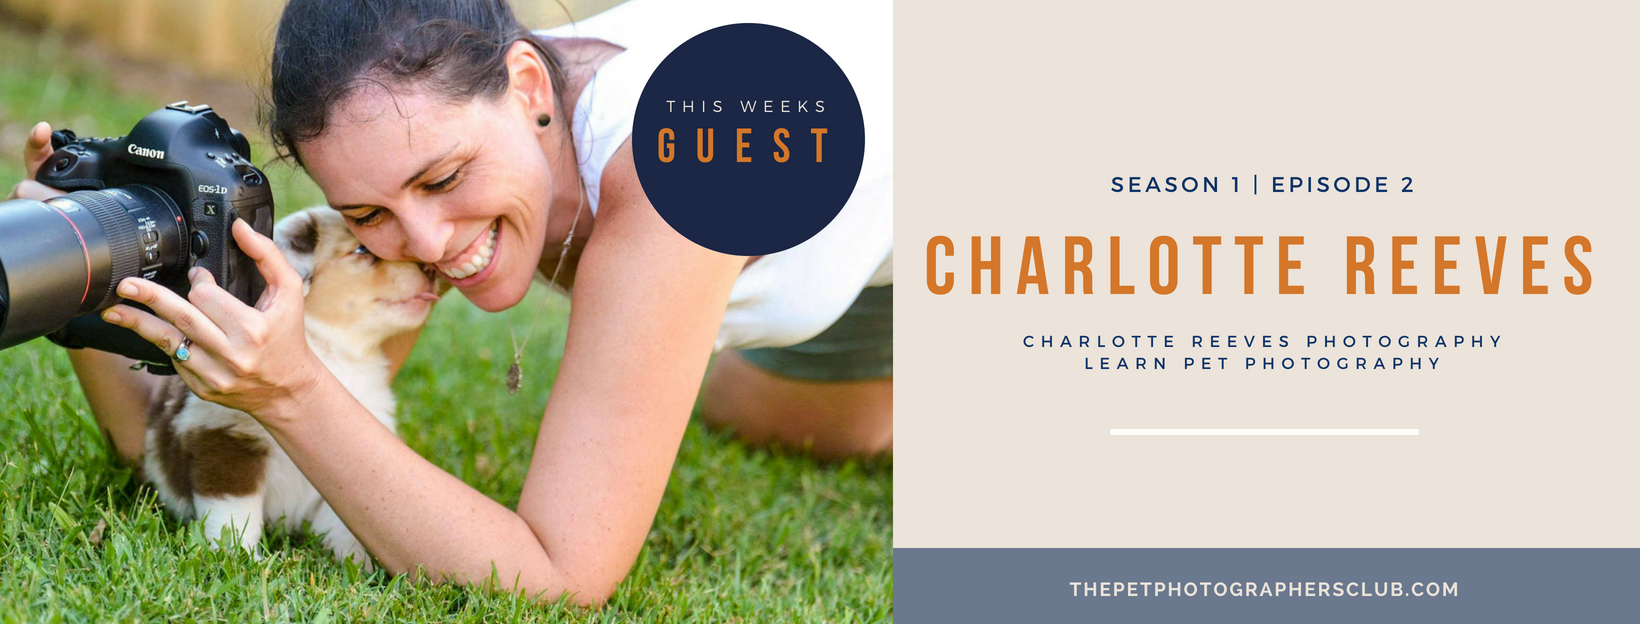 CharlotteReeves-howtofindyourstyleimproveyourphotographyandgrowyourbusinesswithconfidence.png